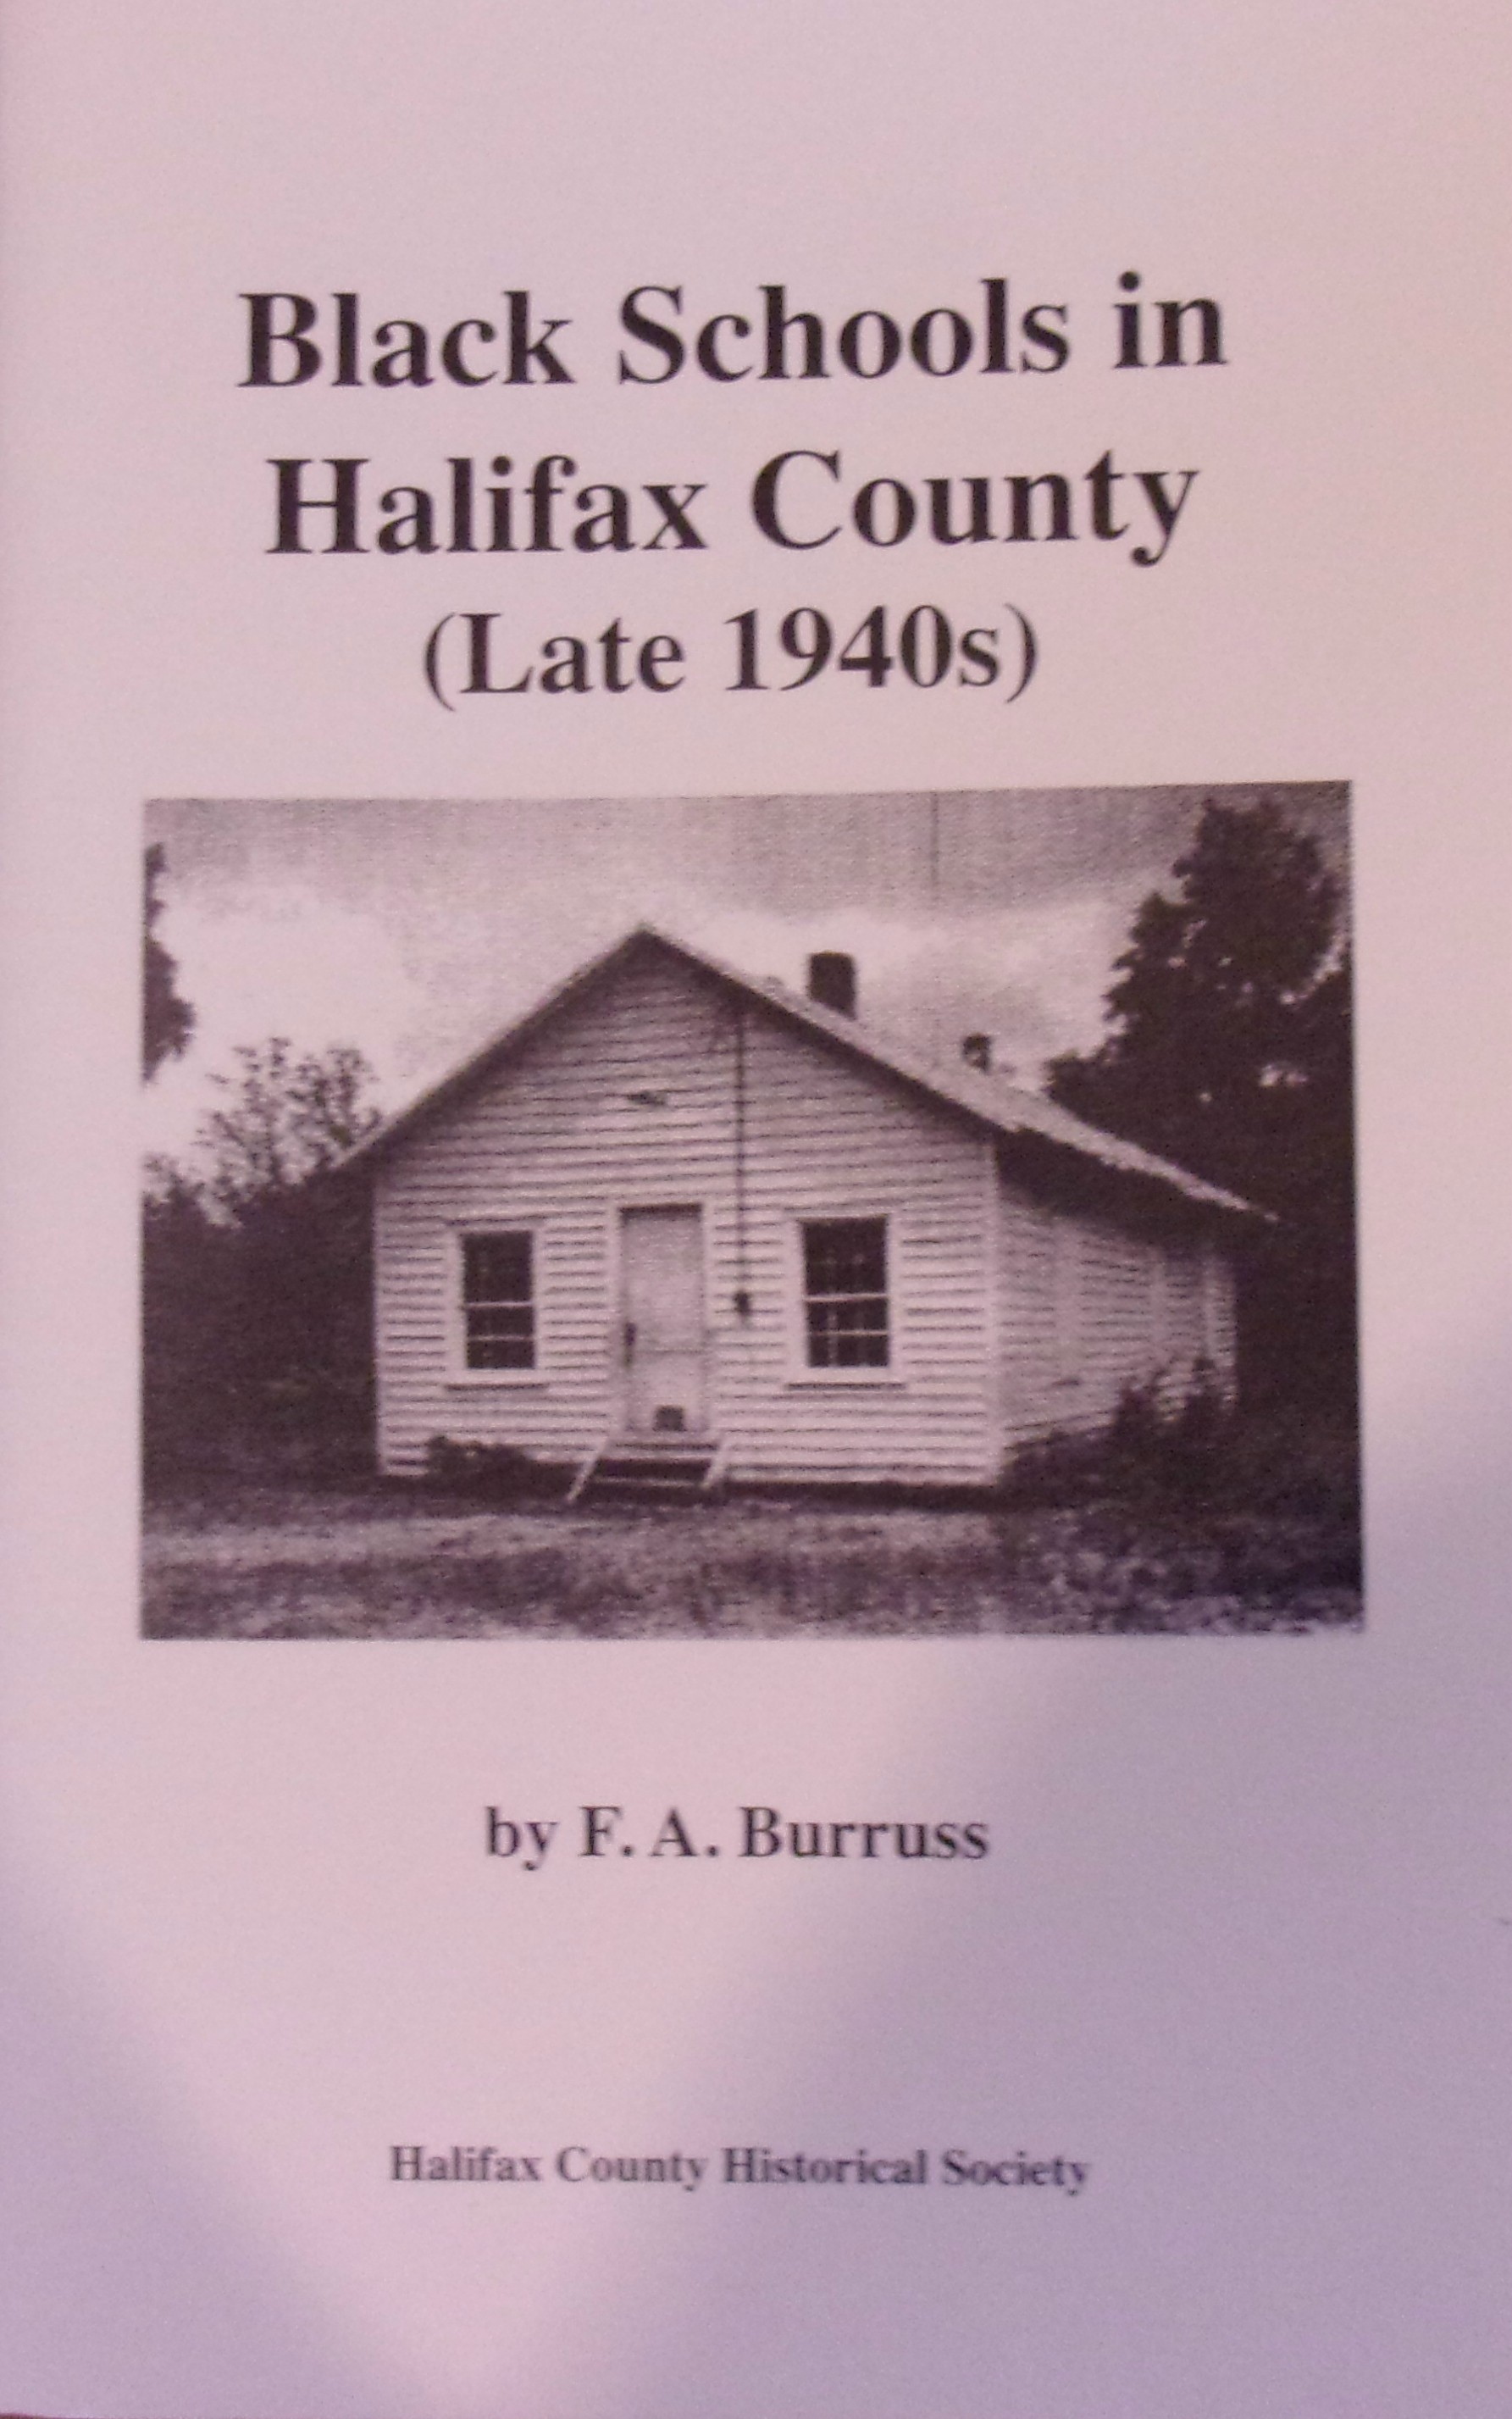 Black Schools in Halifax County (Late 1940s).jpg